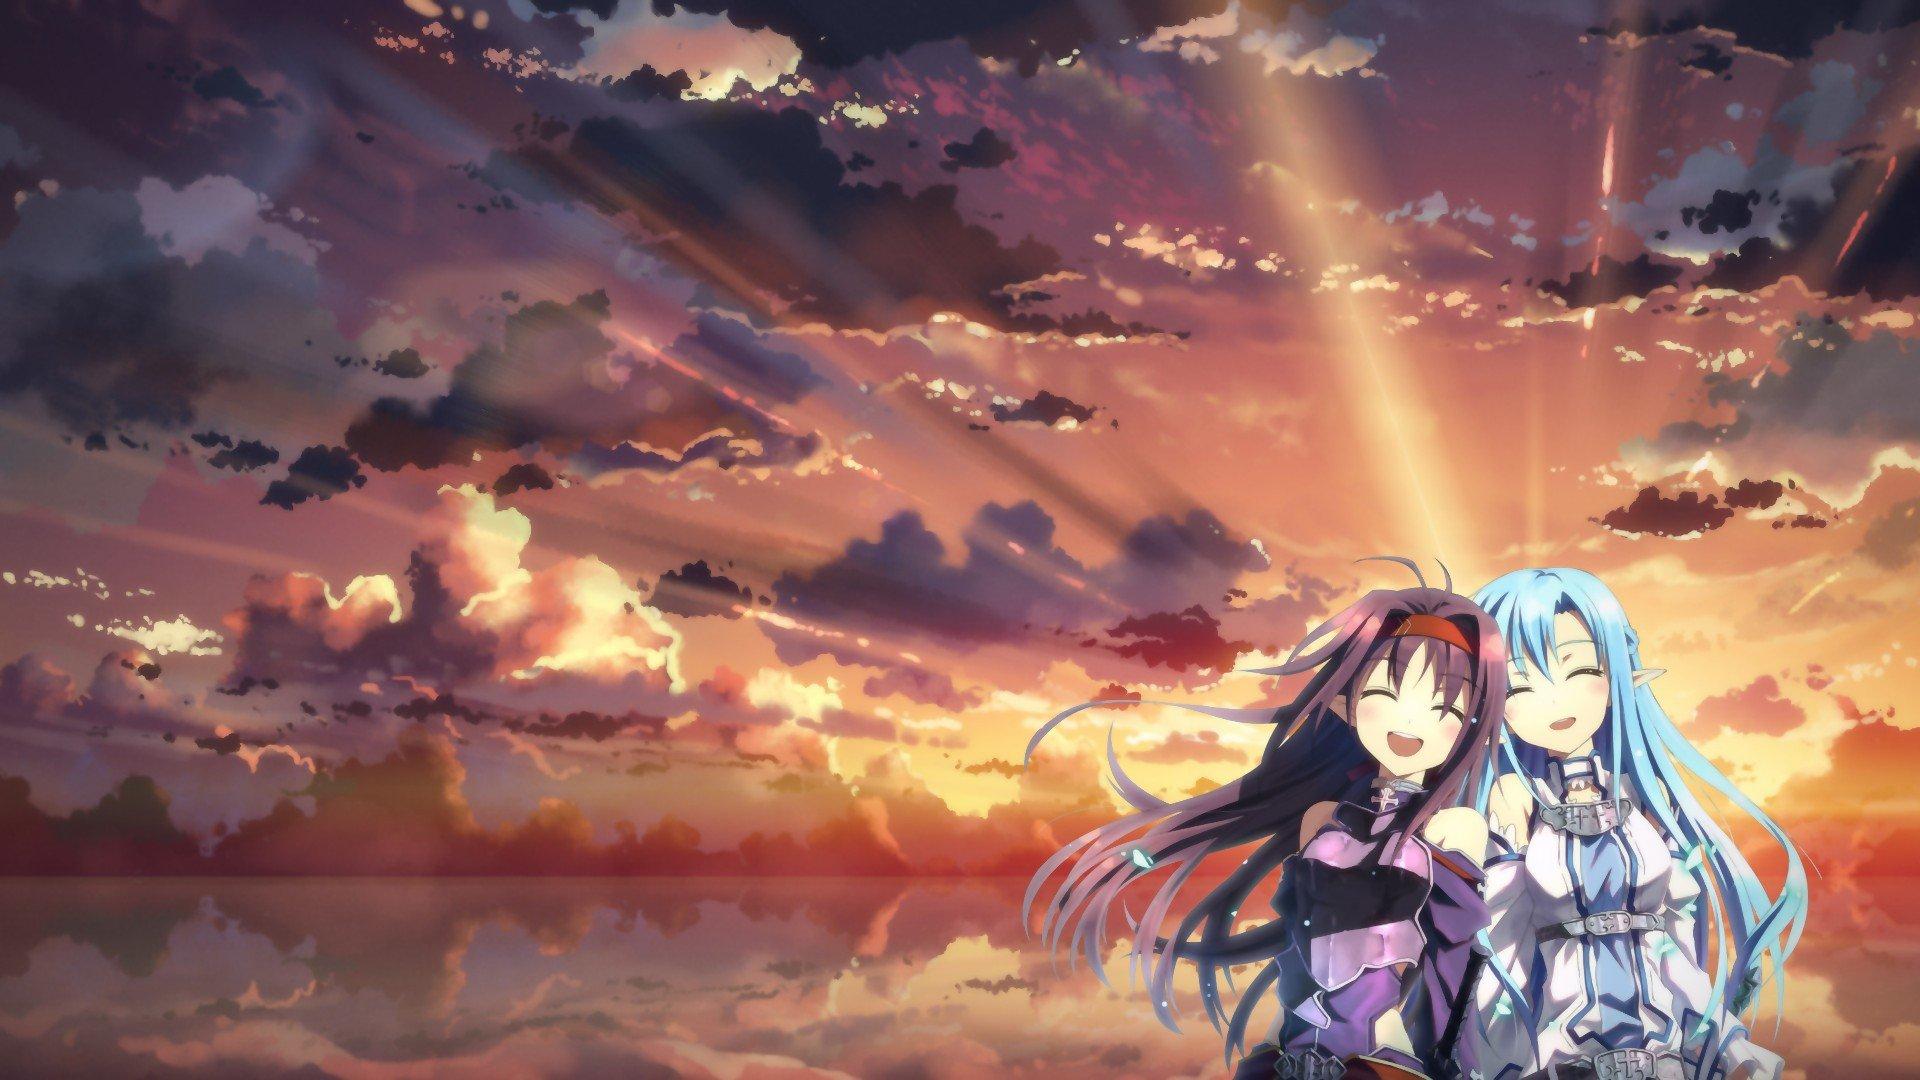 Wallpaper 1920x1080 Px Konno Yuuki Sword Art Online Yuuki